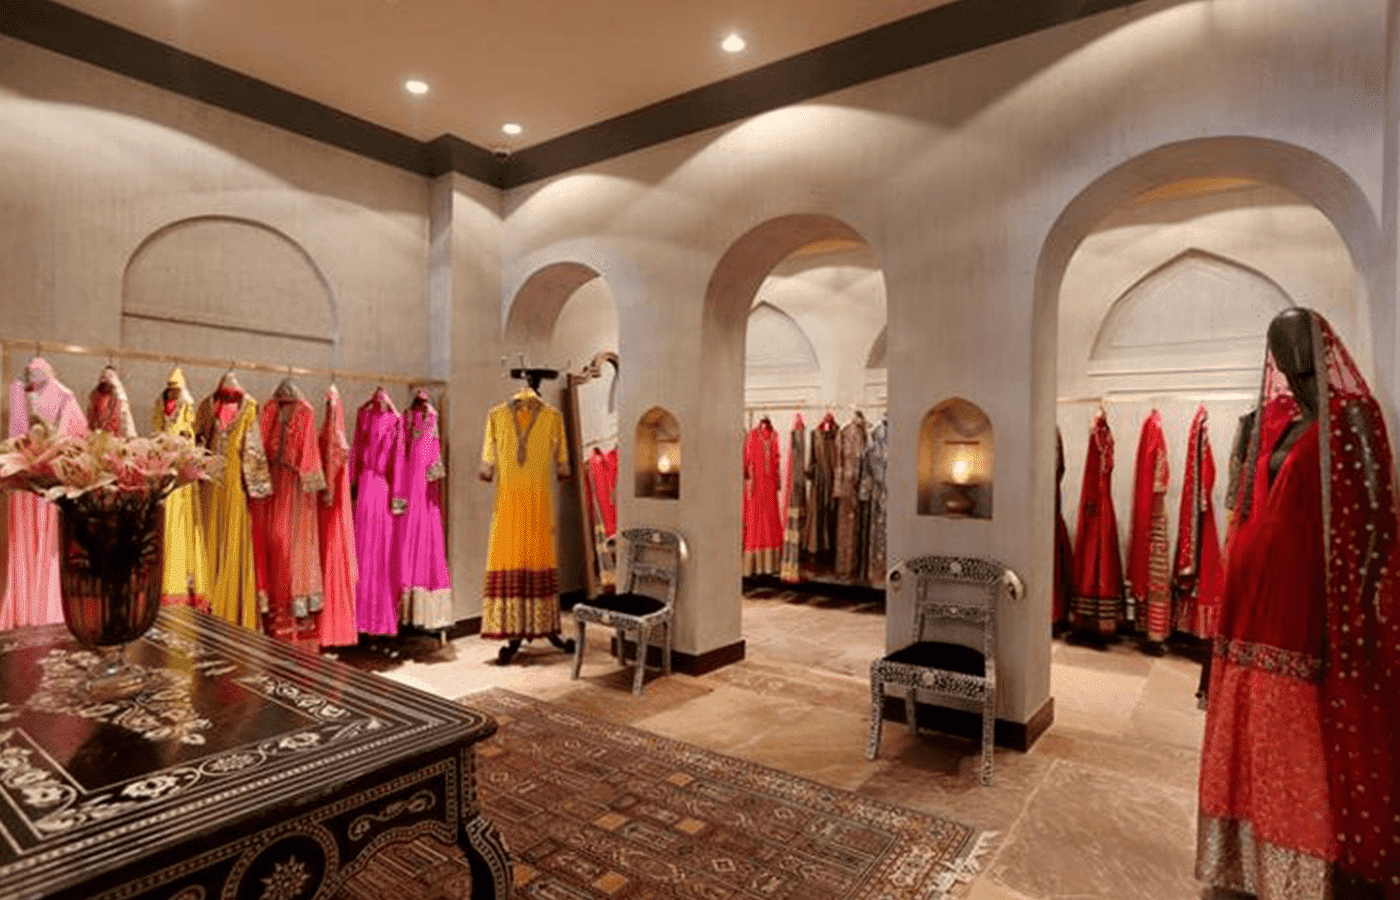 indian-clothing-store-interior-design-for-ladies-garment-shop-750x469